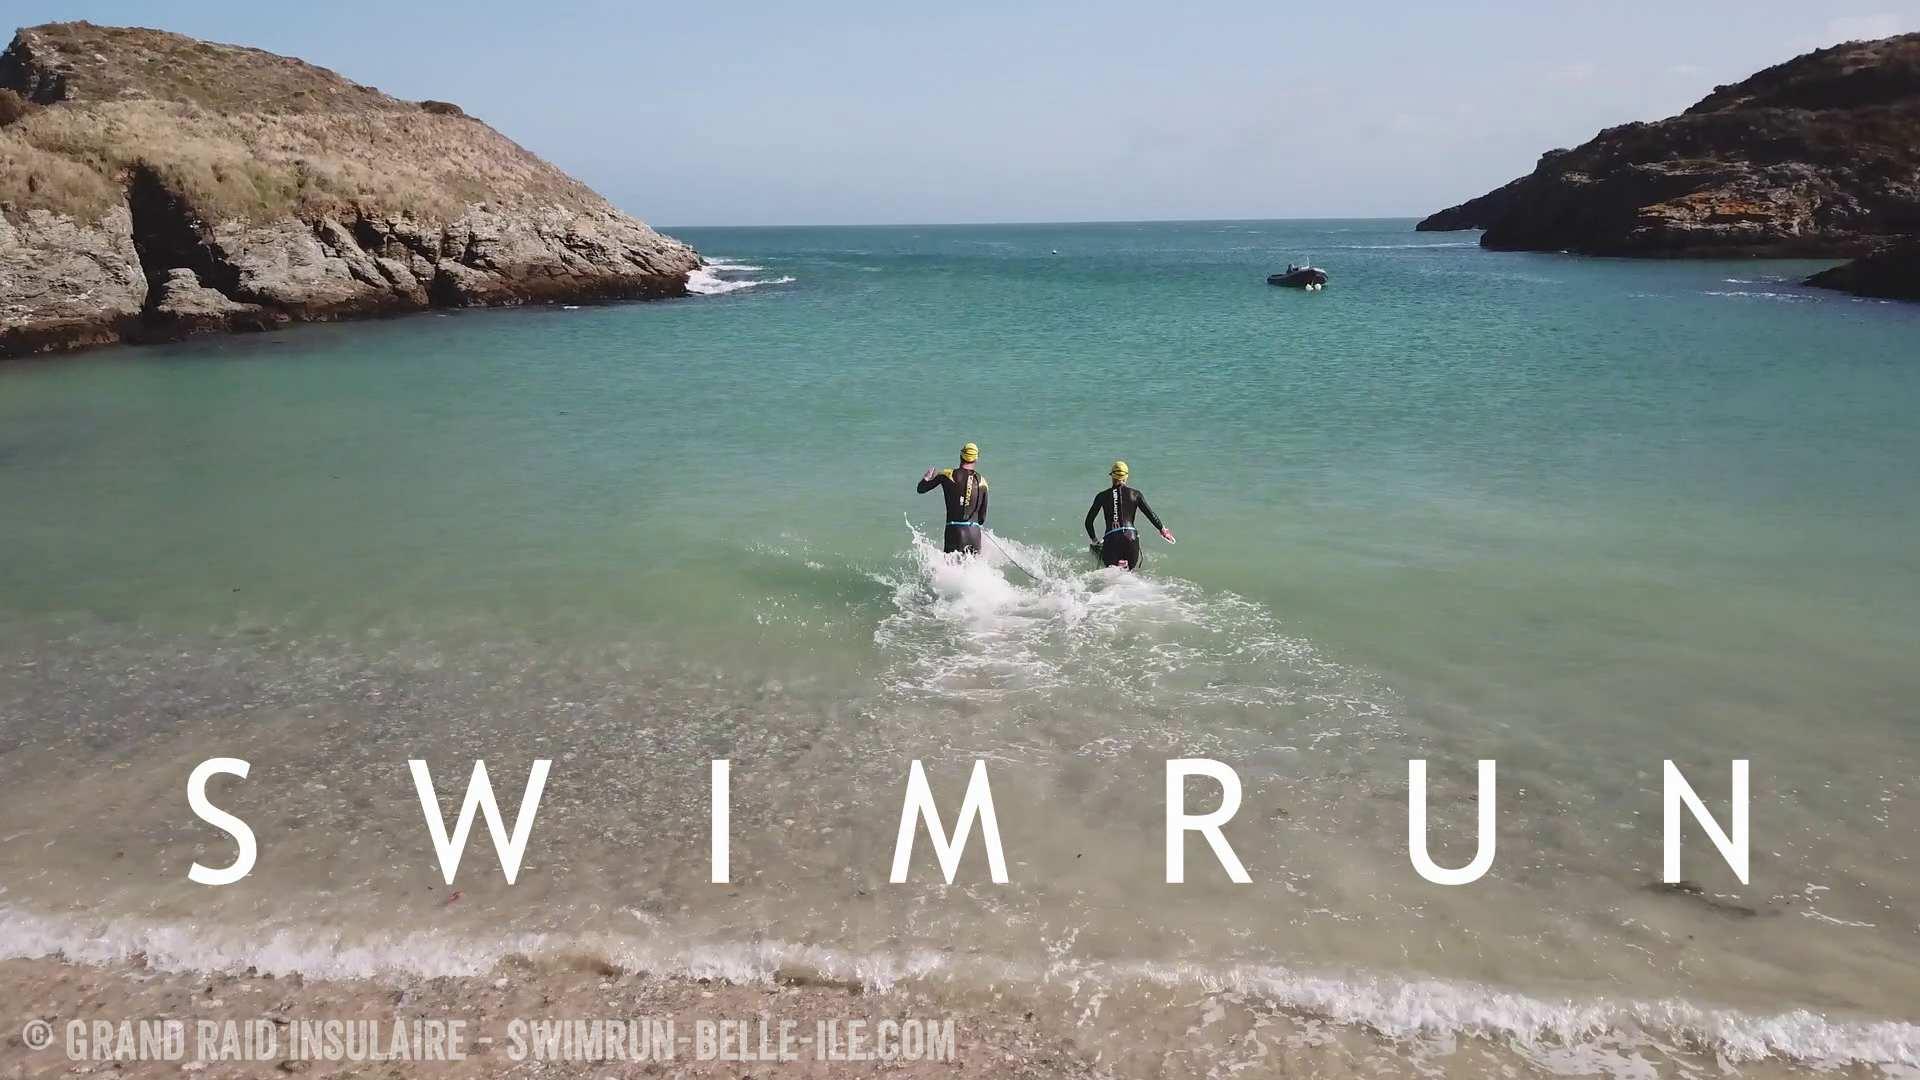 swimrun-hd_teaser_cr_resize_31